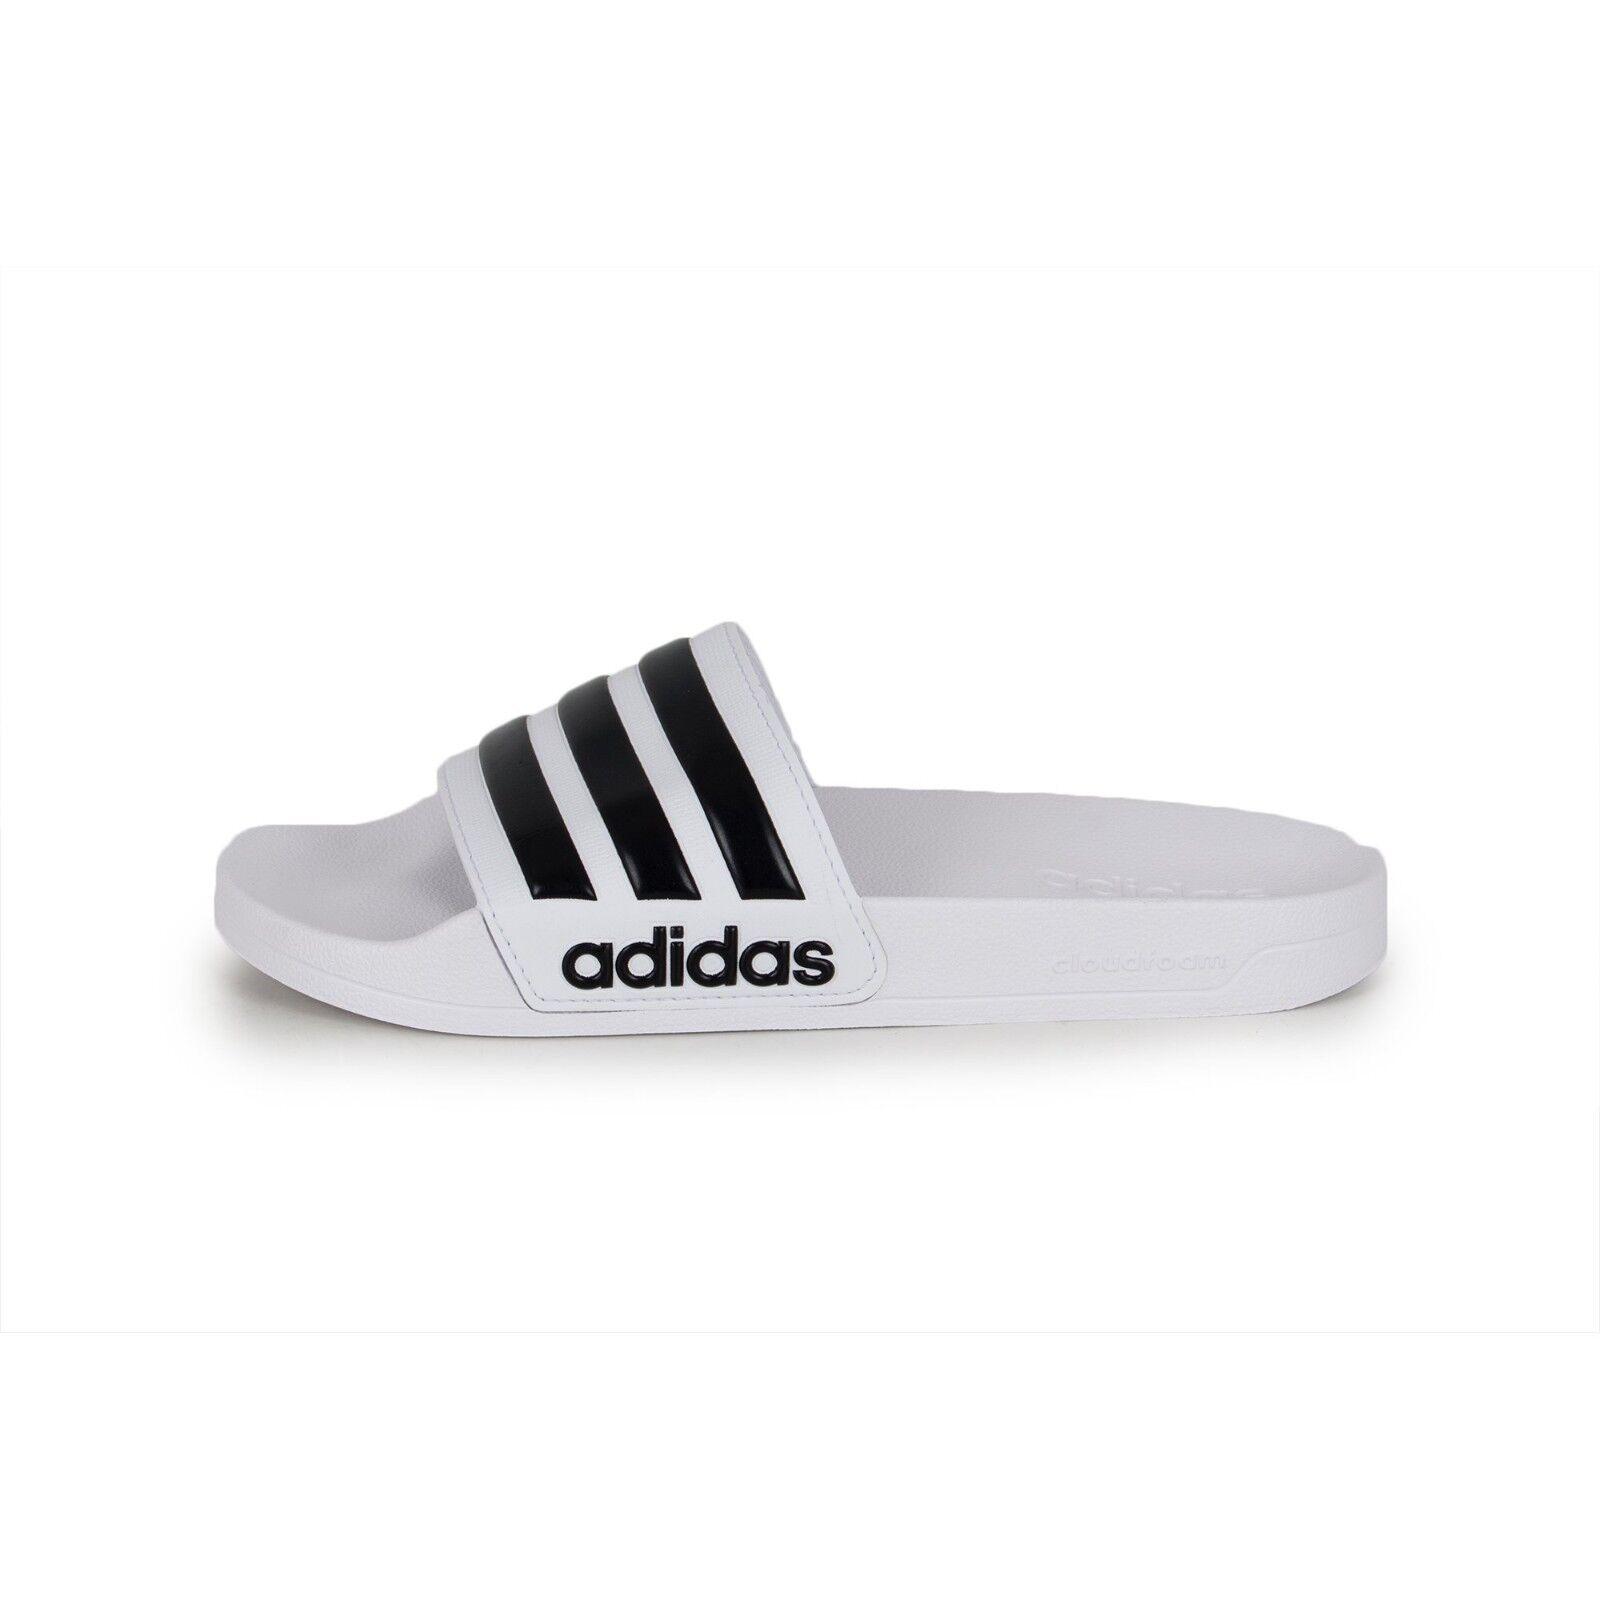 Adidas CF Adilette Slides Sandal Slippers AQ1702 White/Black